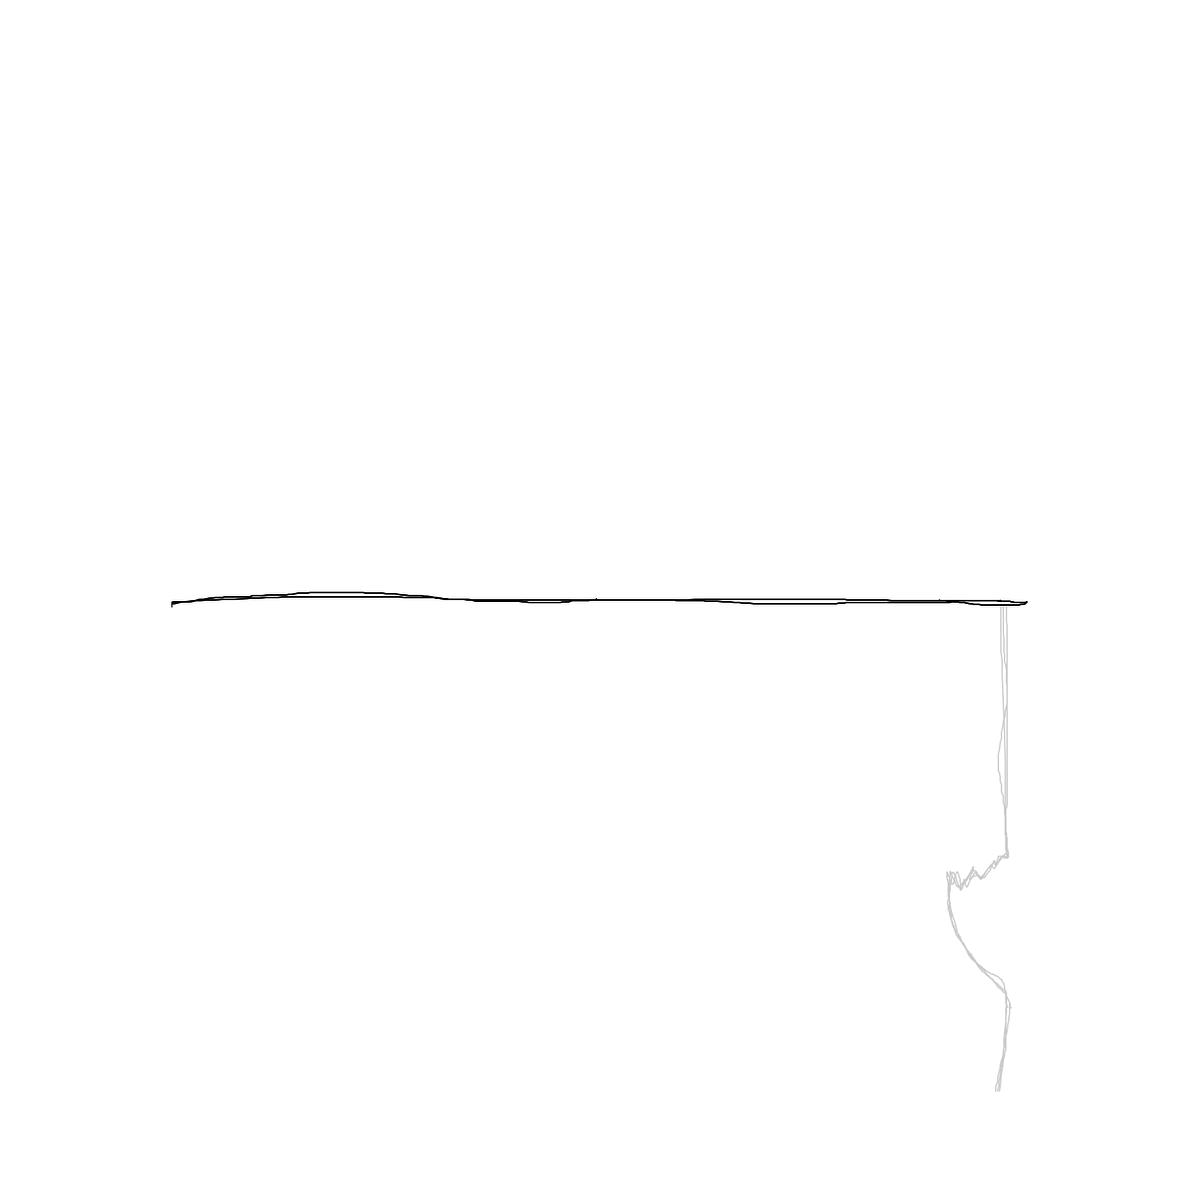 BAAAM drawing#10736 lat:51.0363807678222660lng: -114.0524520874023400